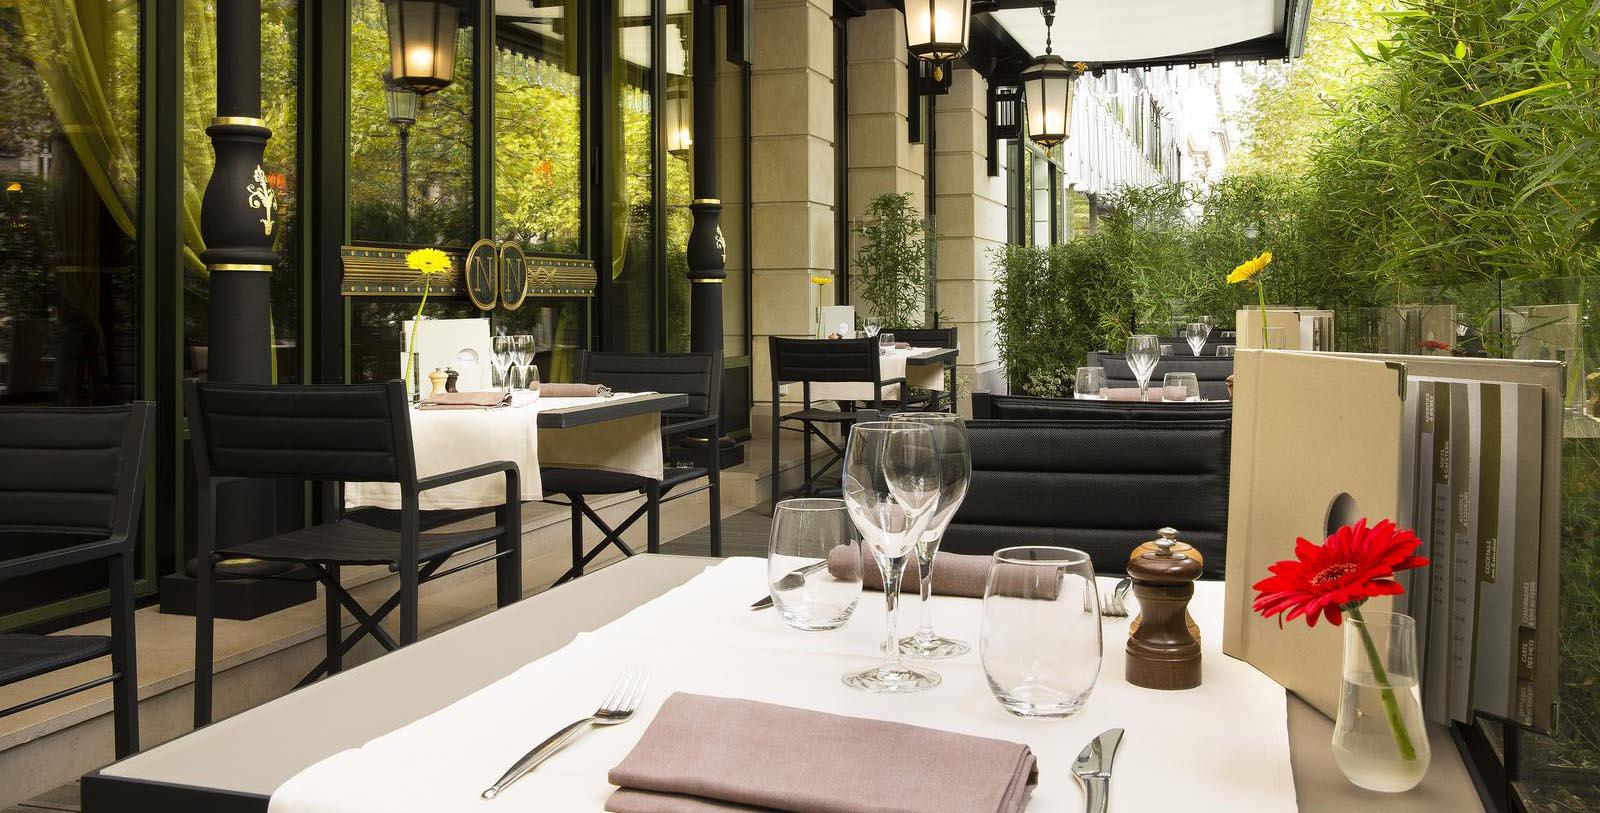 Image of Terrace Restaurant, Hotel Napoleon Paris, France, 1928, Member of Historic Hotels Worldwide, Taste